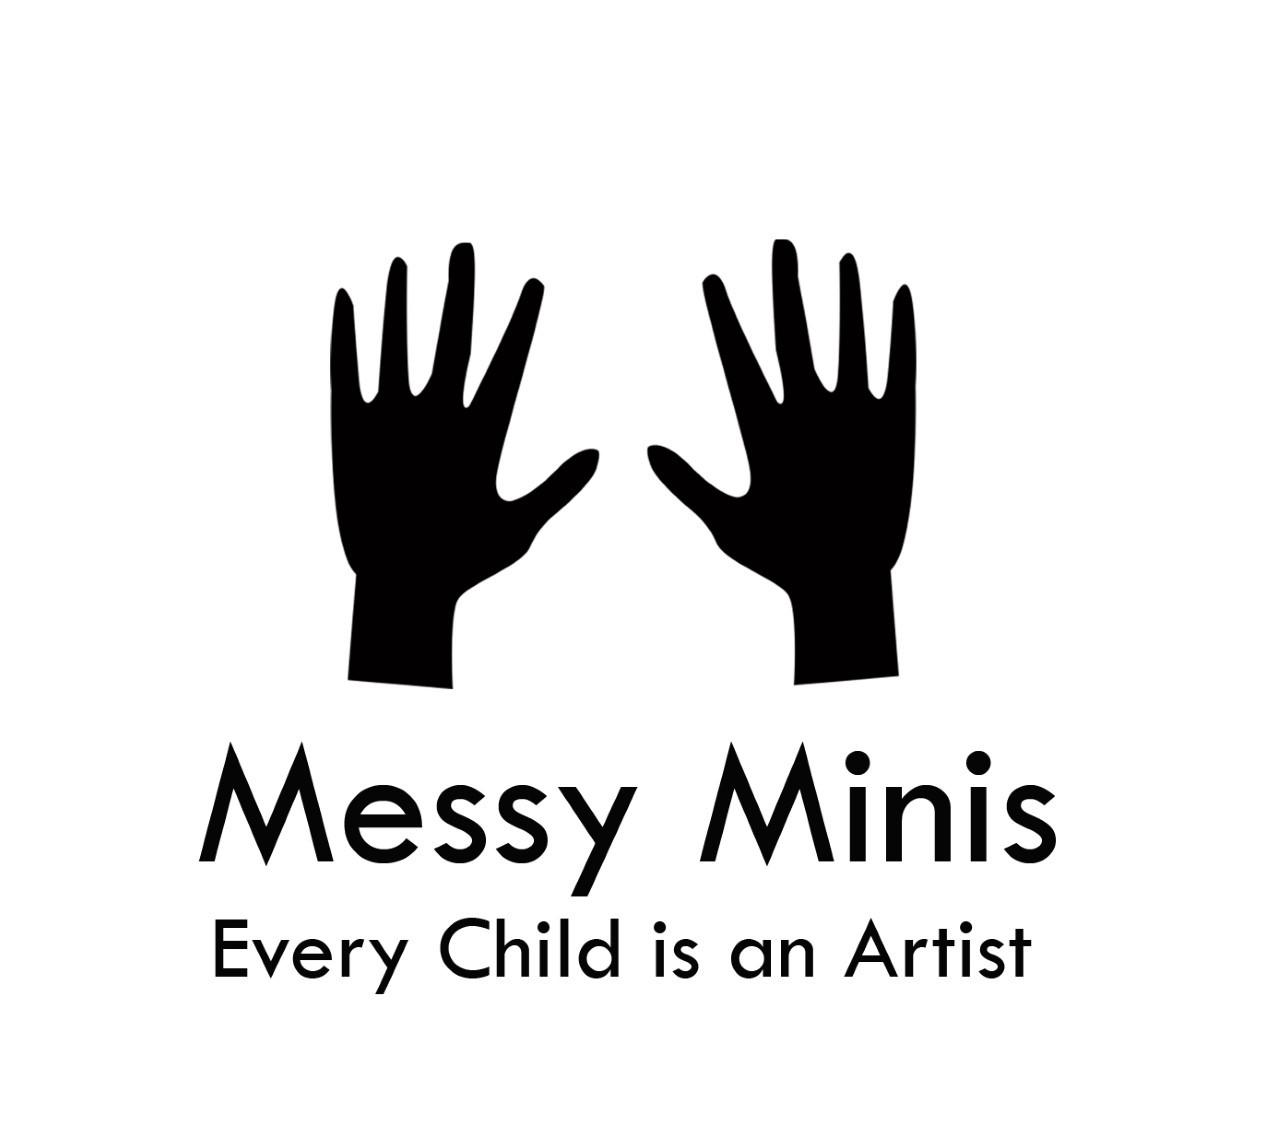 Messy Minis